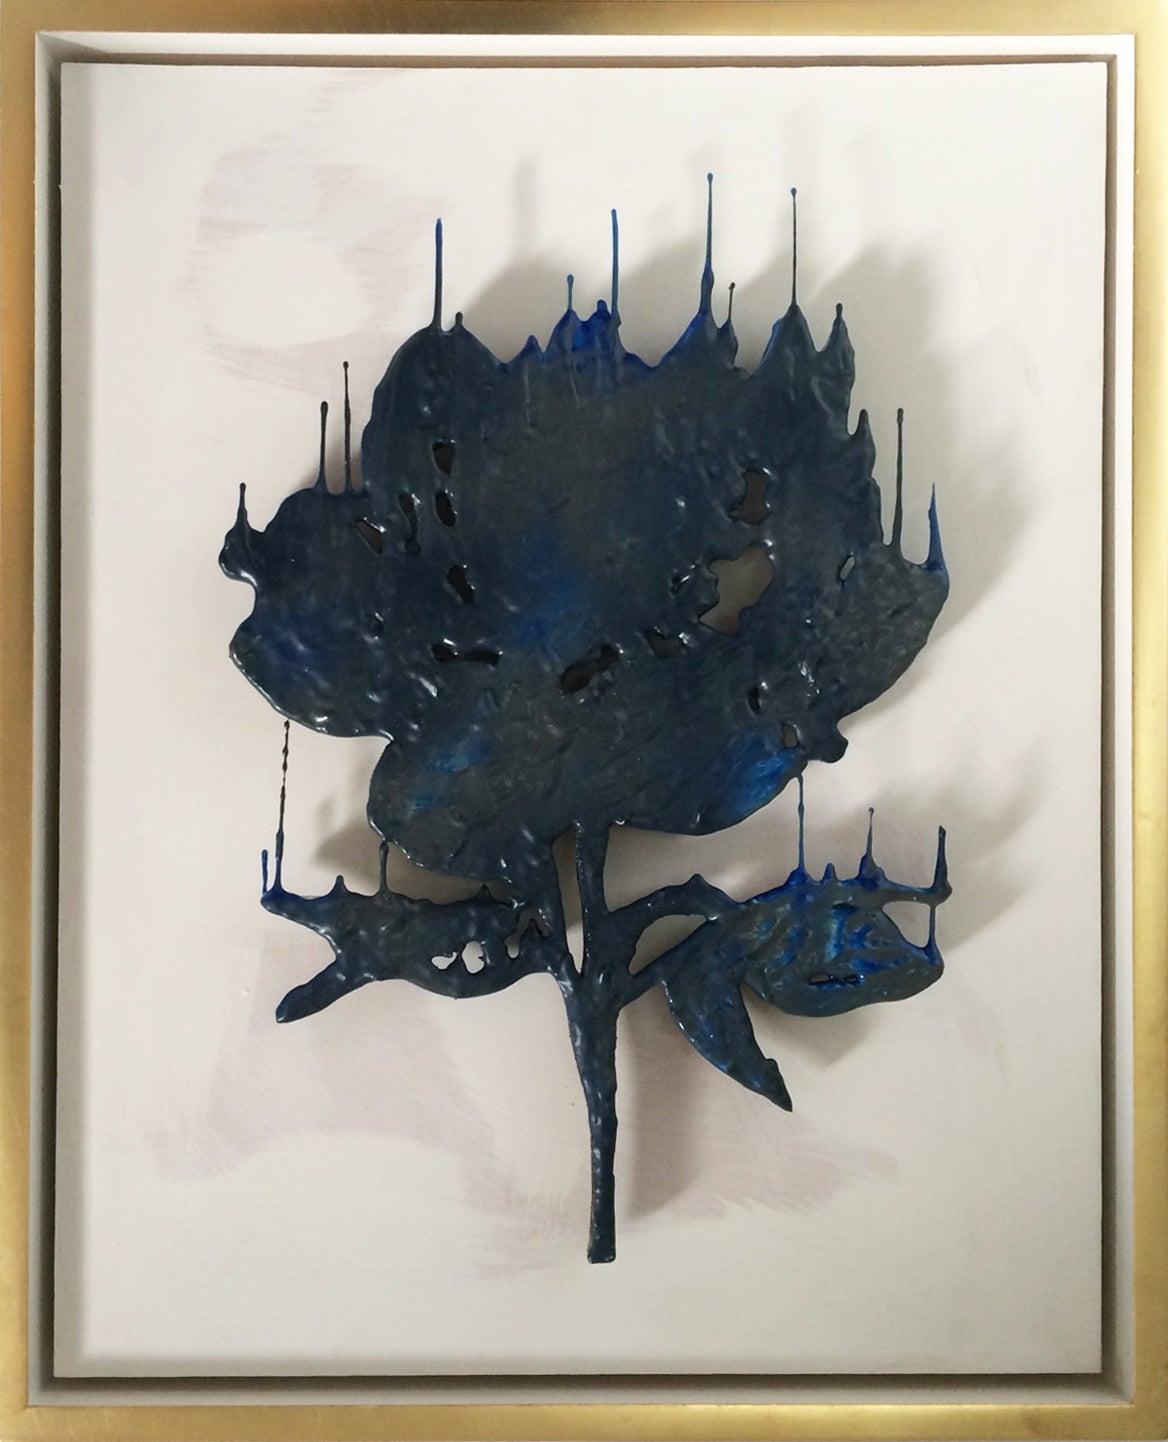 Contemporary artist Peter Buchman's